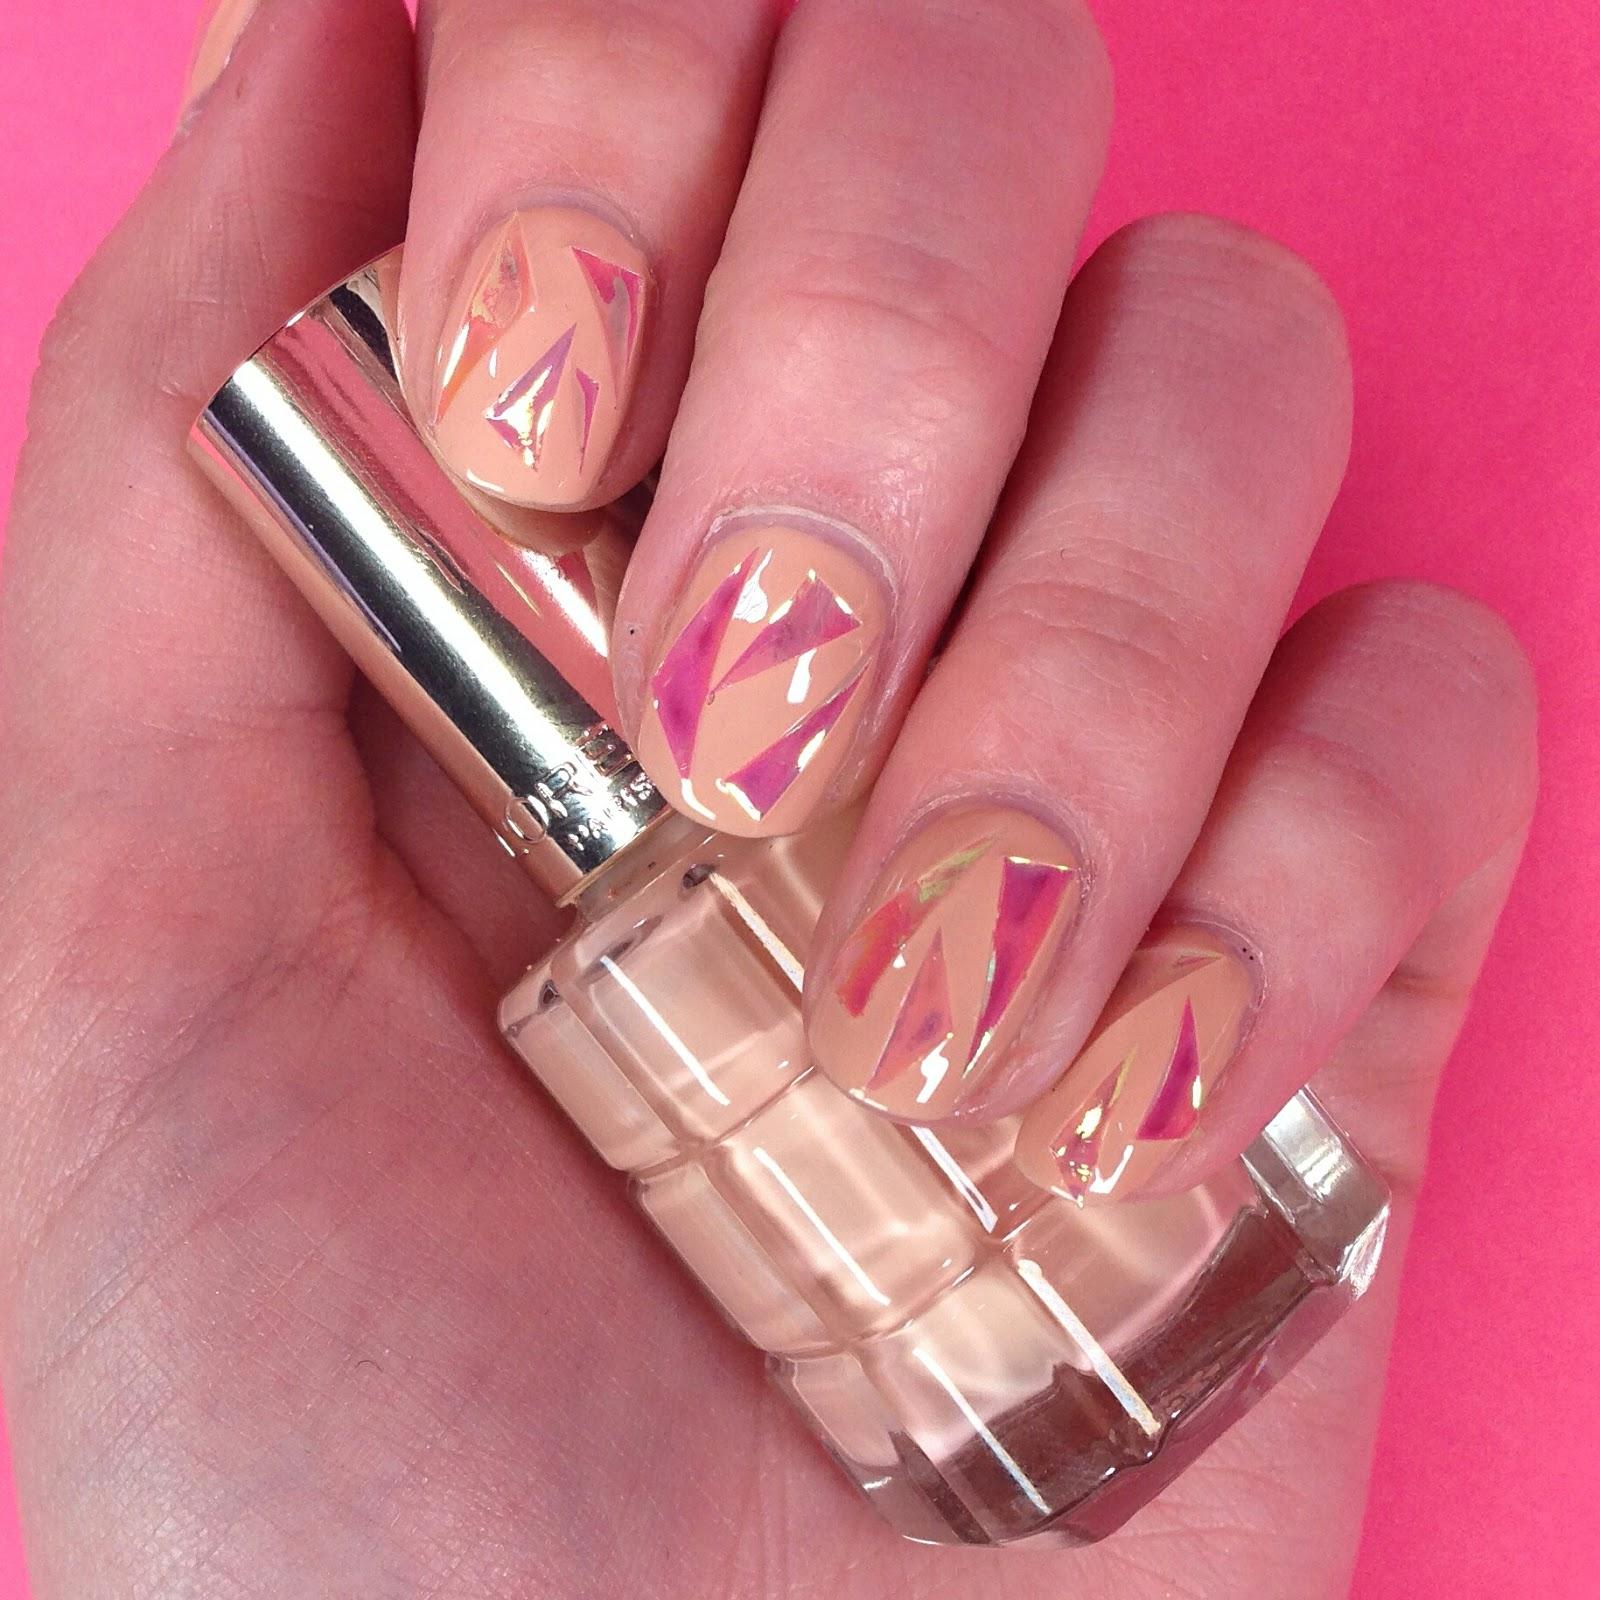 Dahlia nails shattered glass nail art tutorial with icon uk shattered glass nail art tutorial with icon uk prinsesfo Choice Image